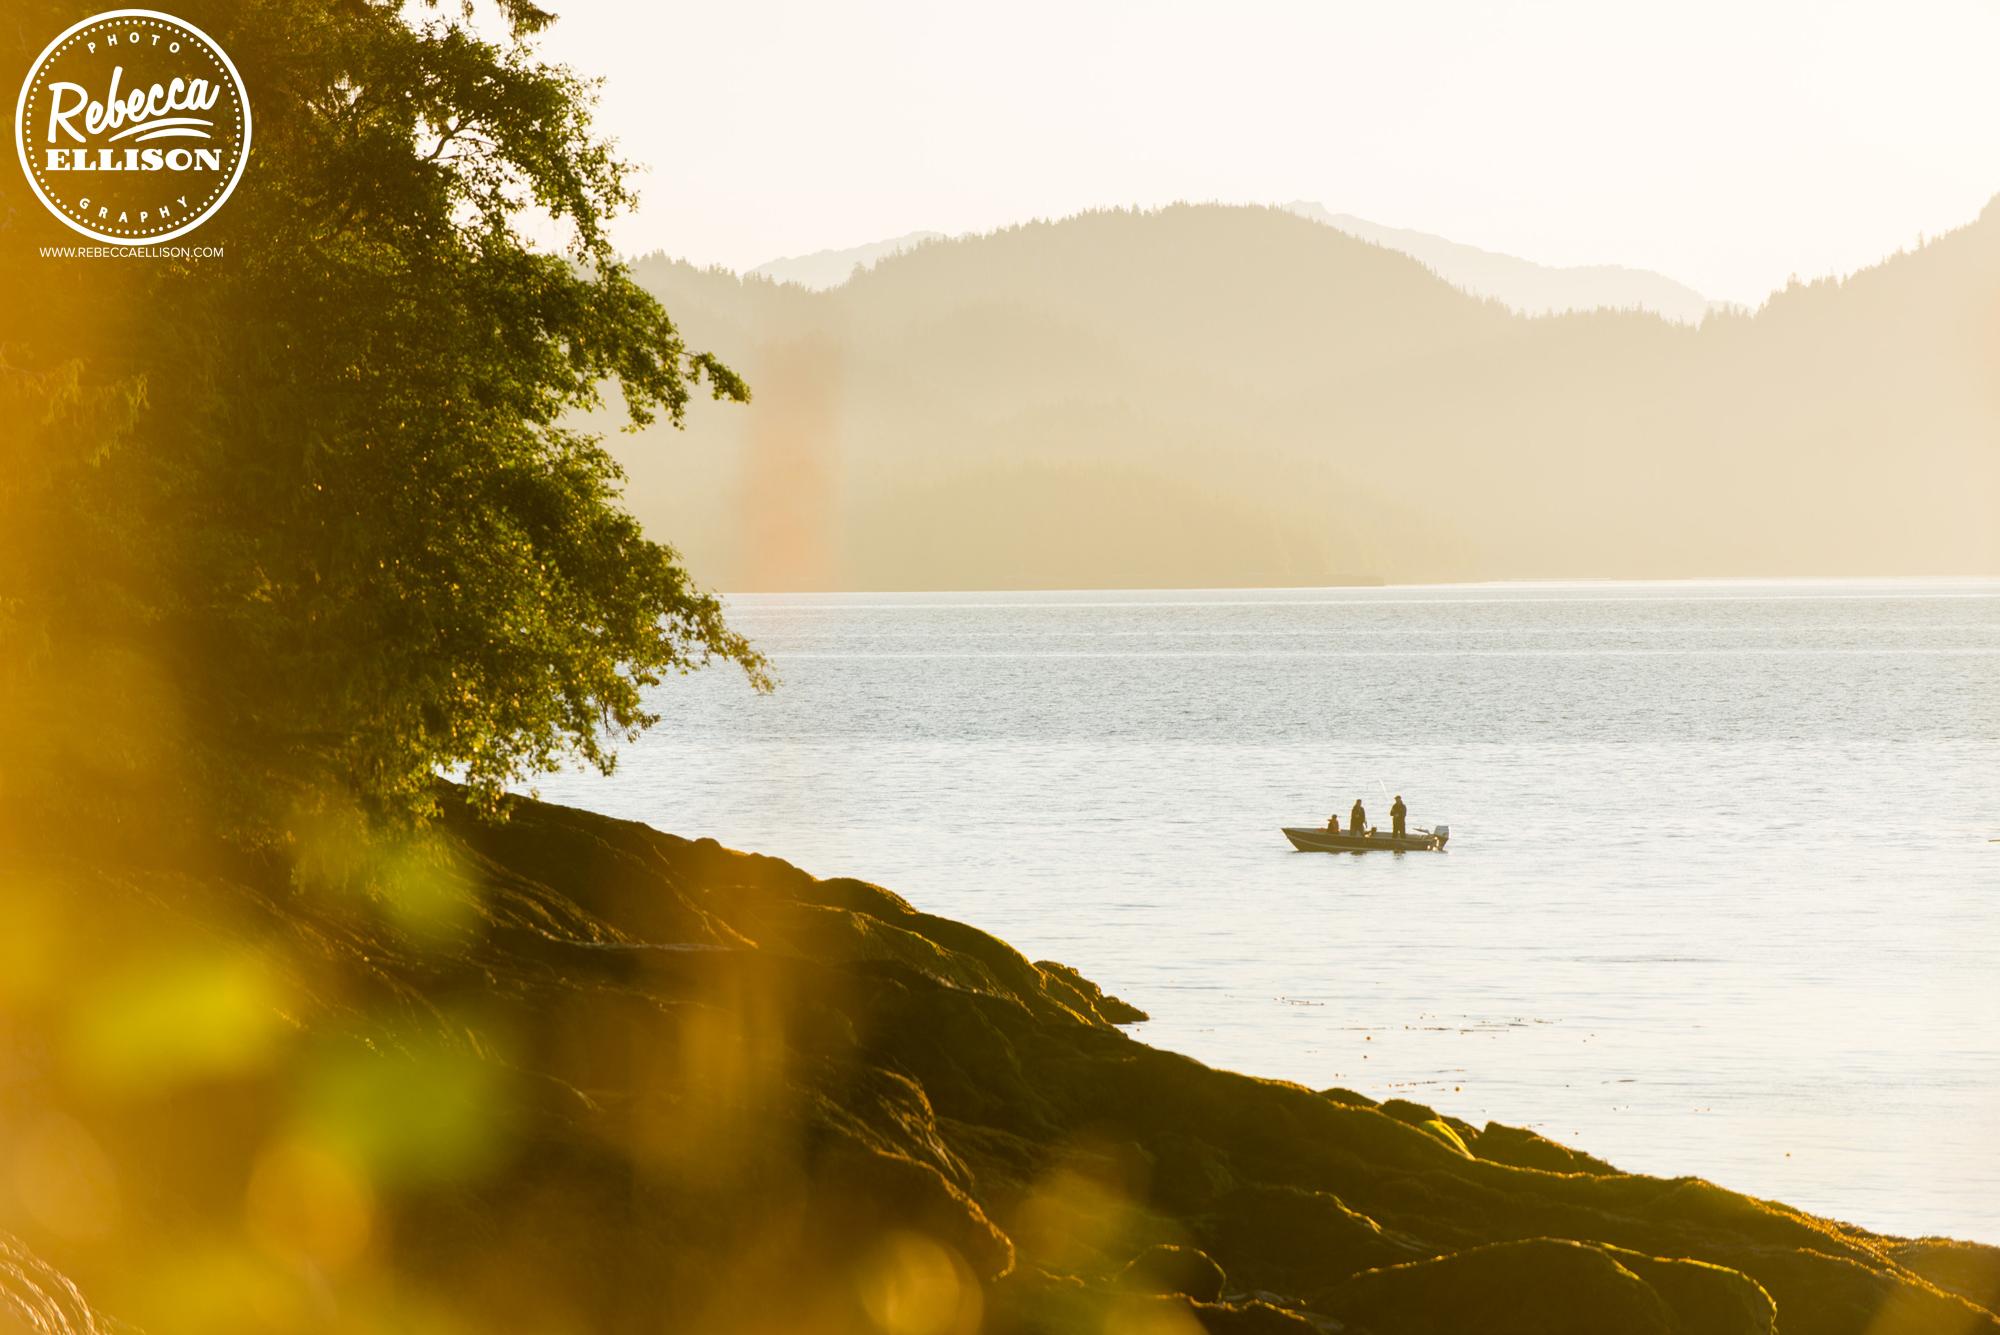 Sunrise Alaskan fishing boat near Ketchikan photography by Rebecca Ellison